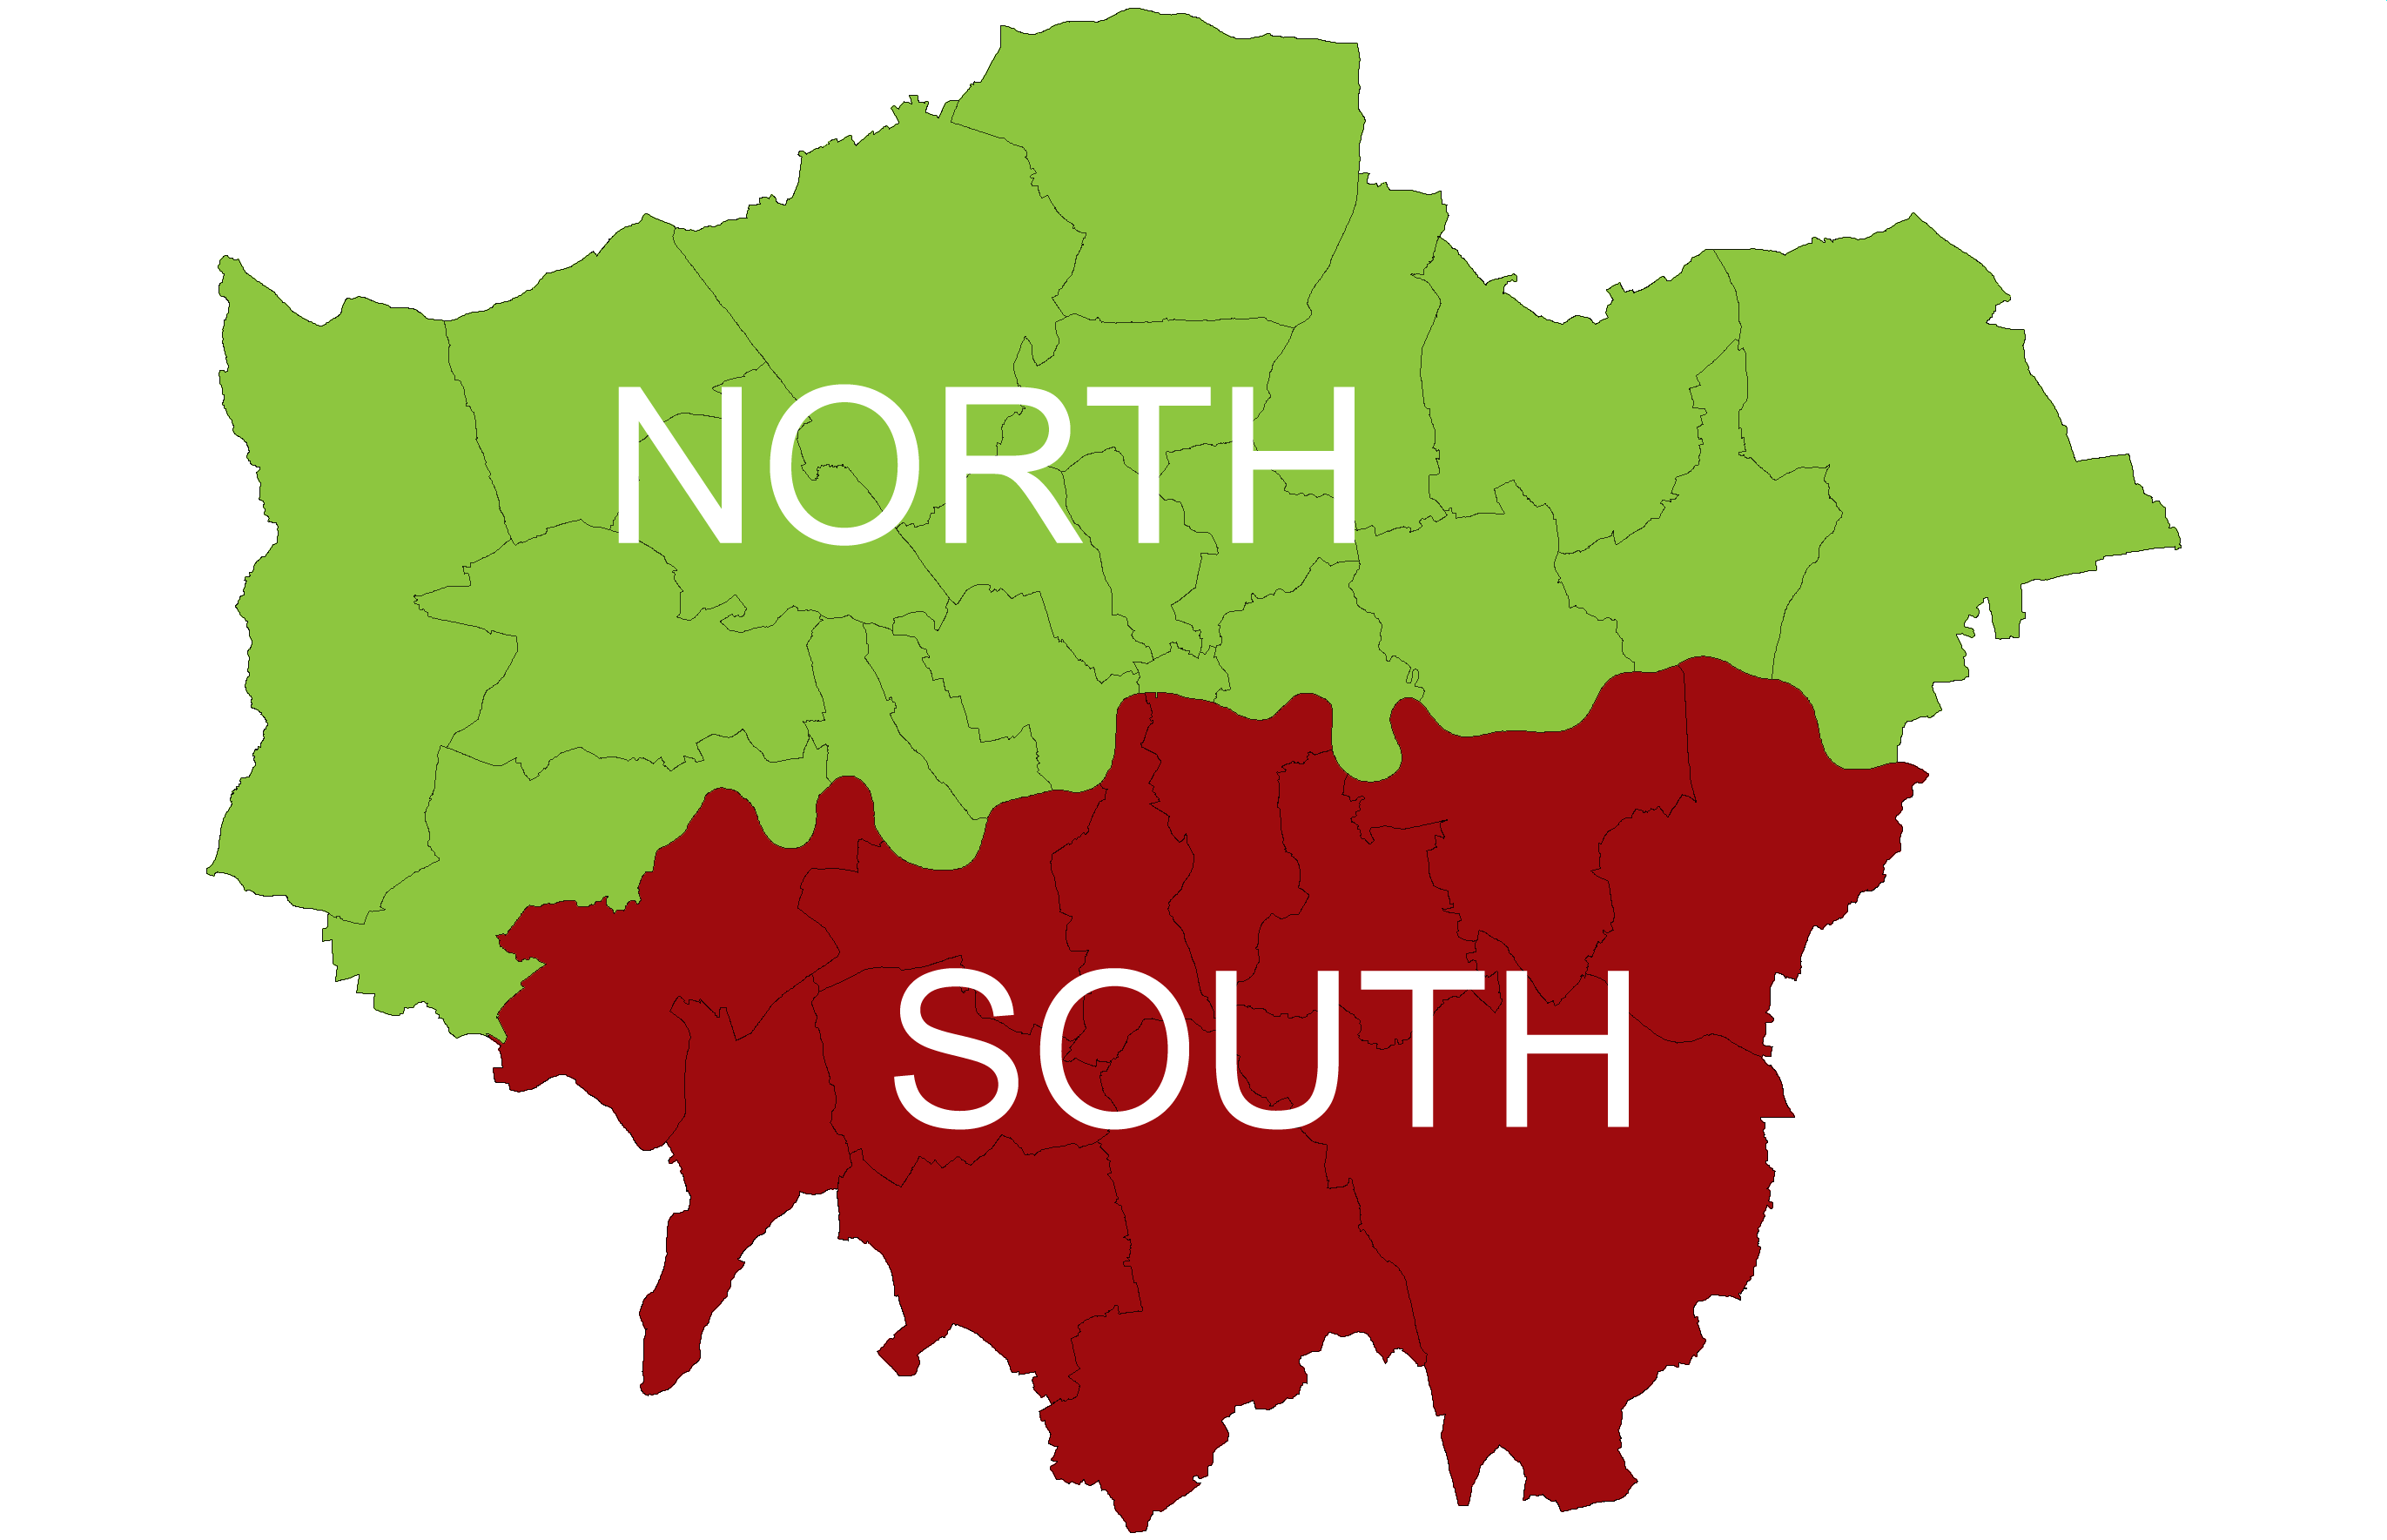 картинки юга и севера кротон резными